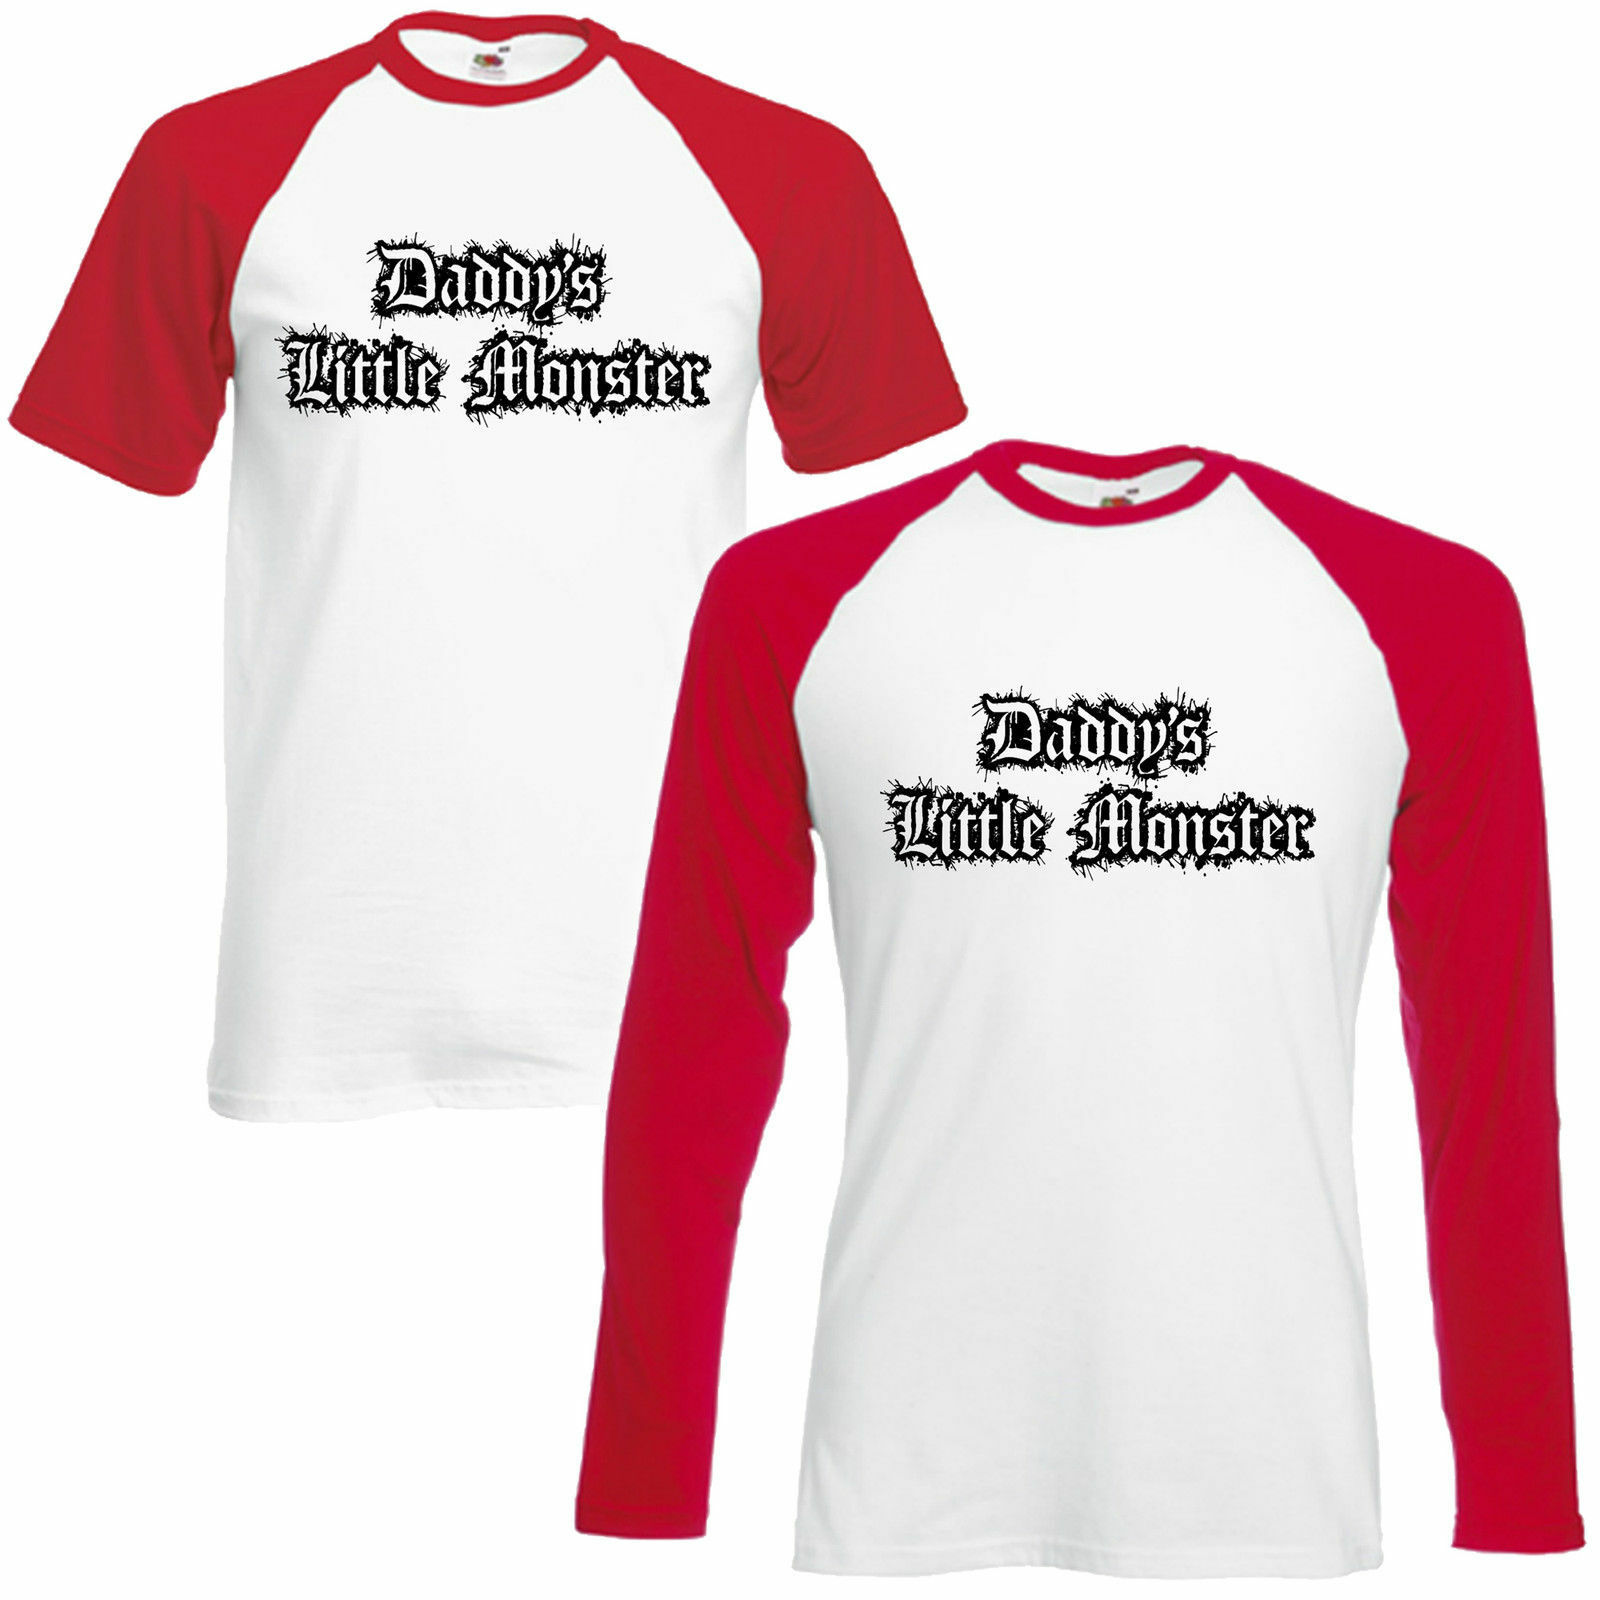 Daddy's Little Monster Baseball T-Shirt Cosplay Lil Harley Quinn Inspired Top